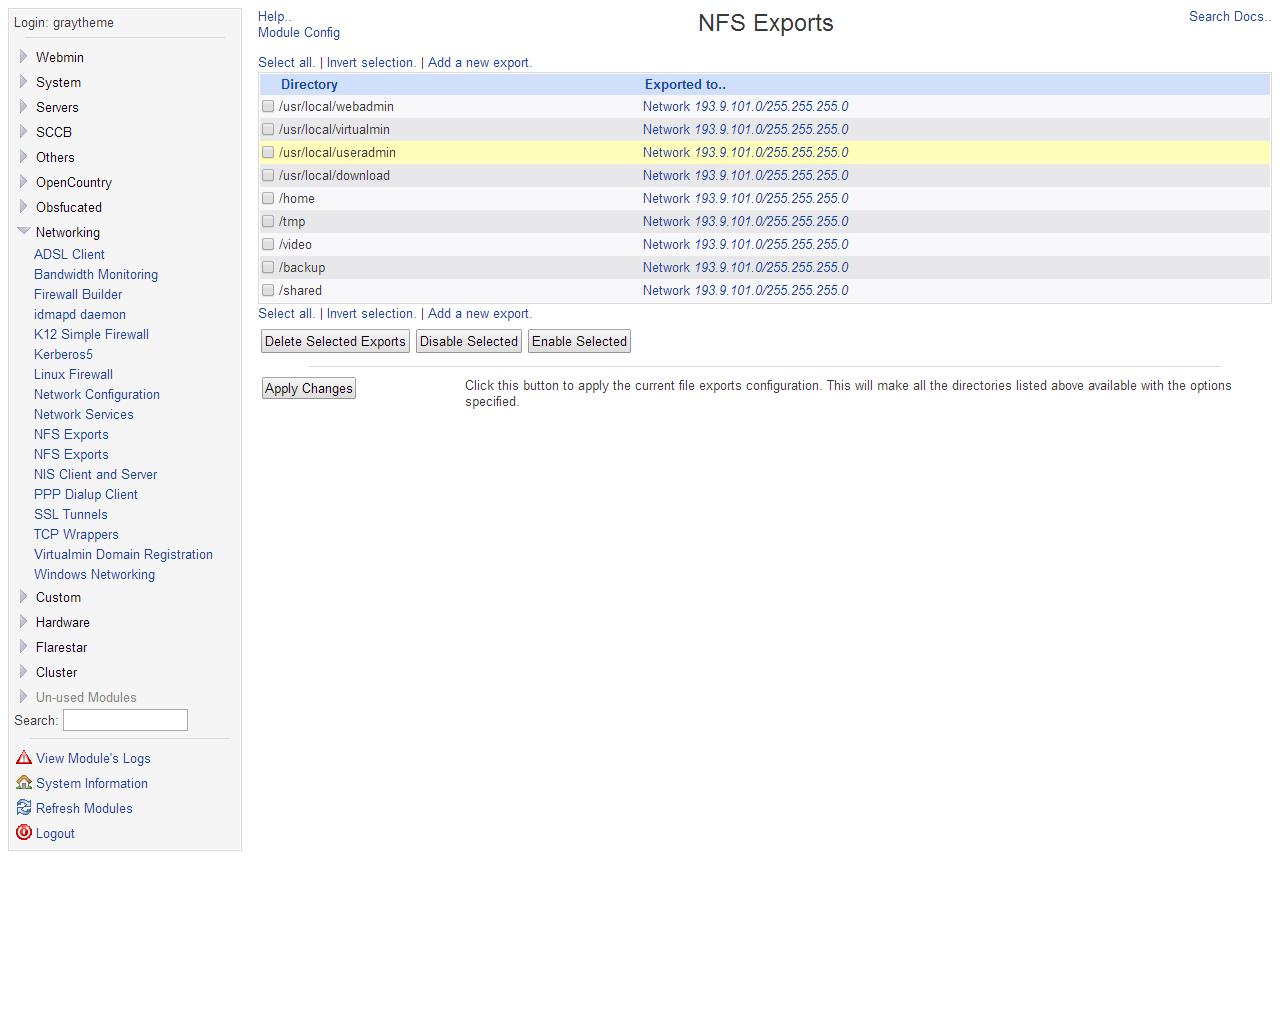 NFS Export